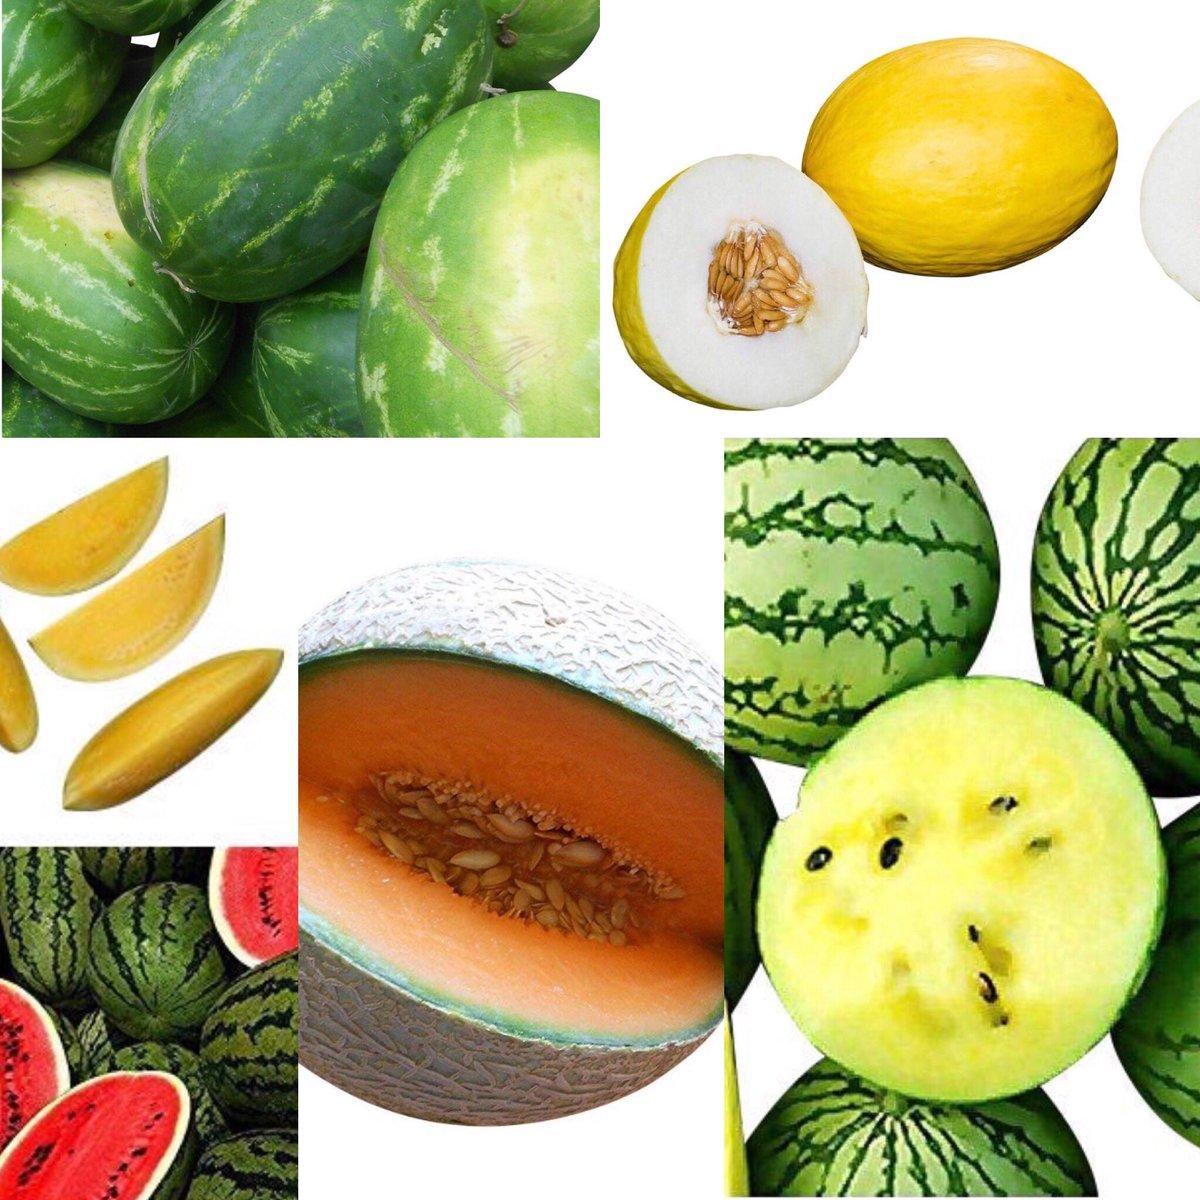 Melone Seeds #melone #melon #giant #seeds #samenchilishop #gardening #GardenersWorld #gardeningtips #gardens https://t.co/3NoDRDcF12